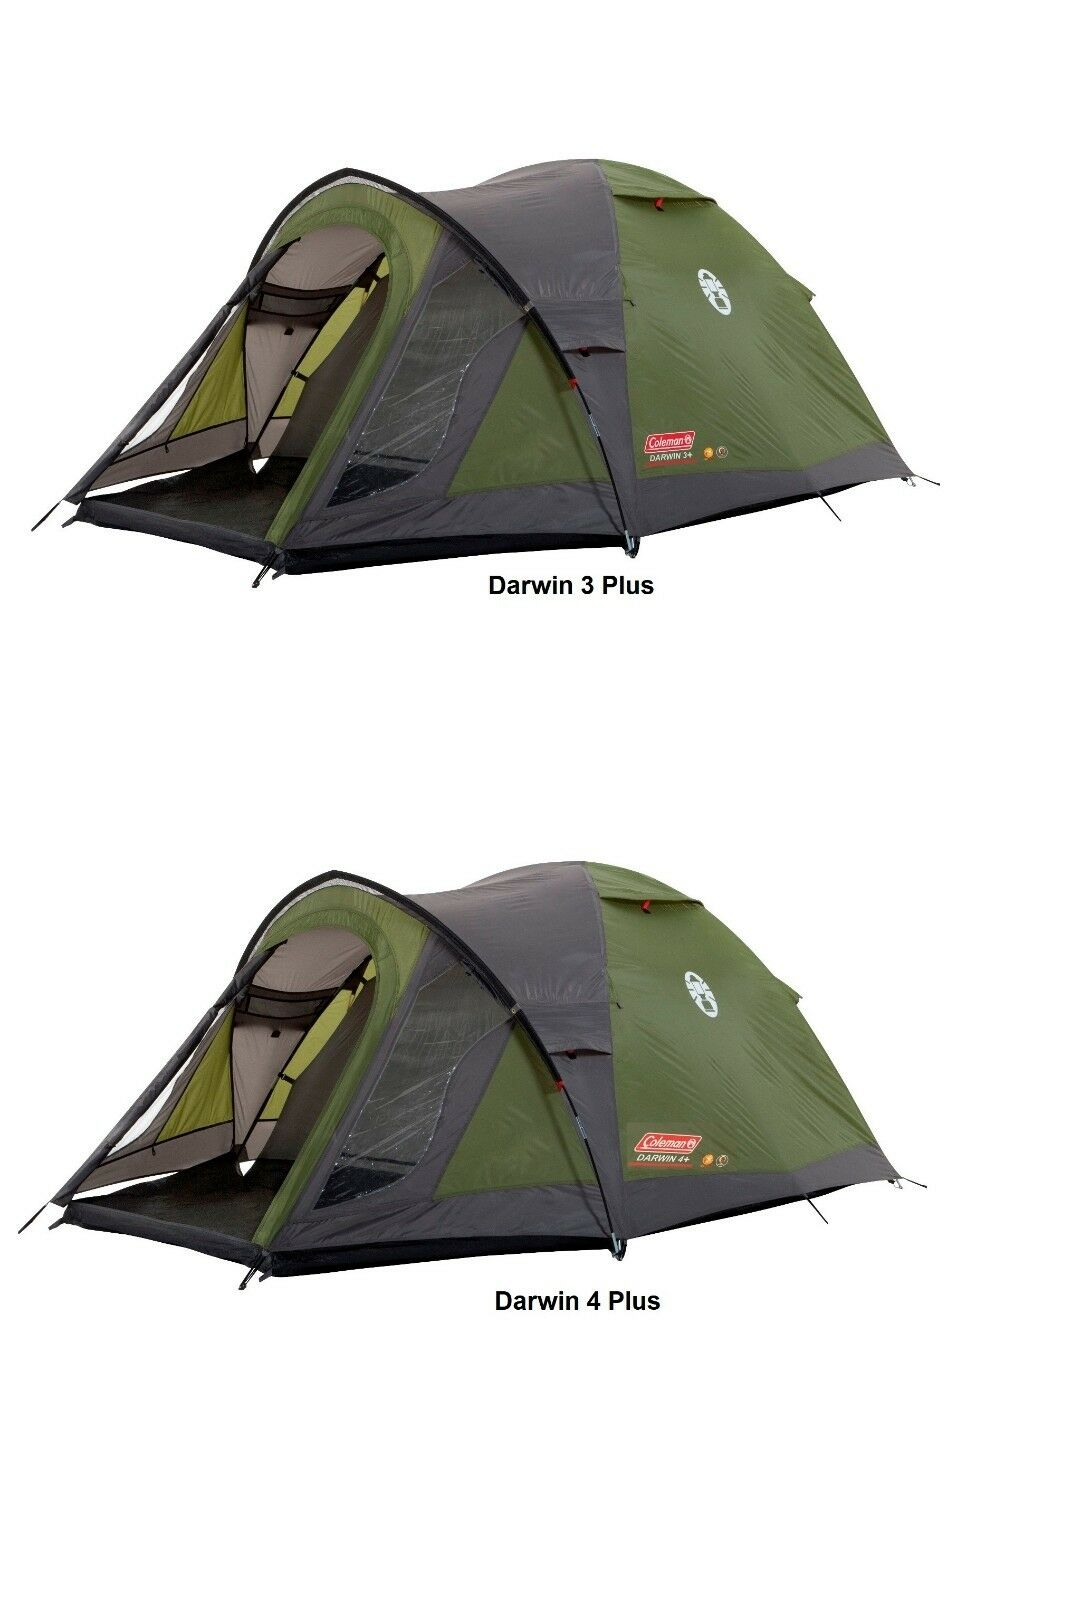 Coleman Darwin 3 Plus oder Darwin 4 Plus Kuppelzelt Kuppelzelt Kuppelzelt Zelt 5295c8